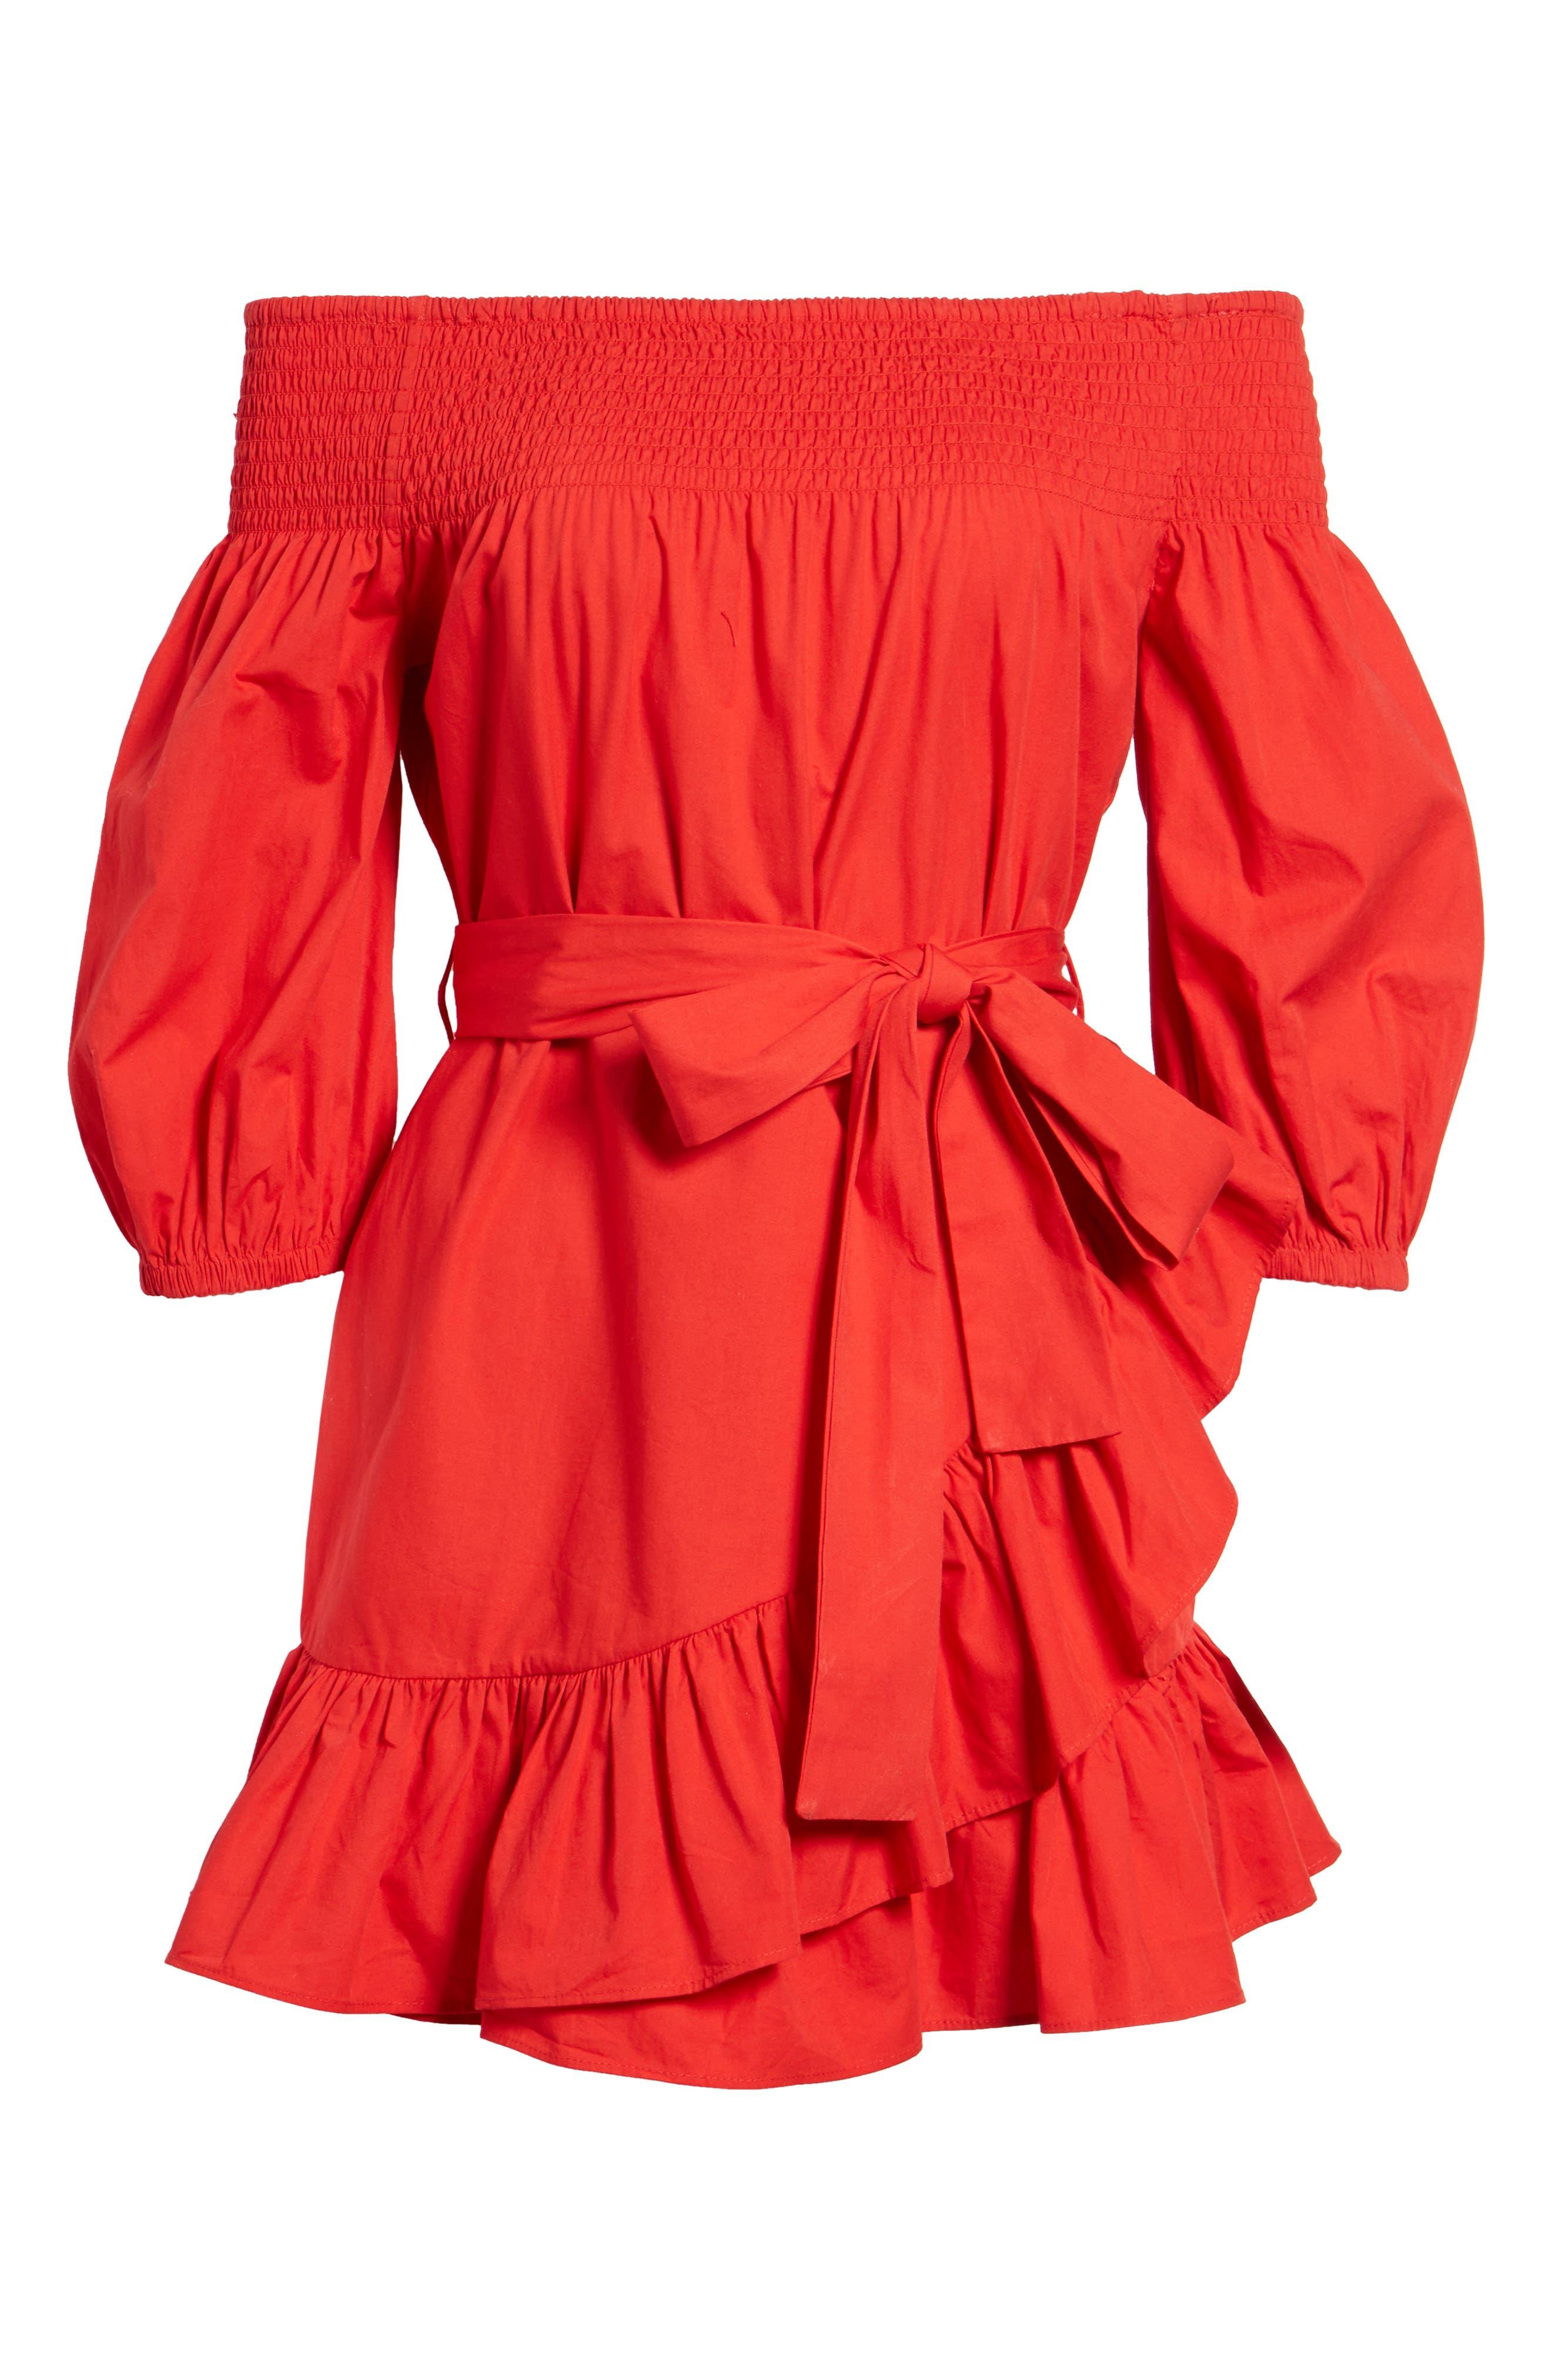 Maida Faux Wrap Ruffle Dress,                             Alternate thumbnail 6, color,                             601